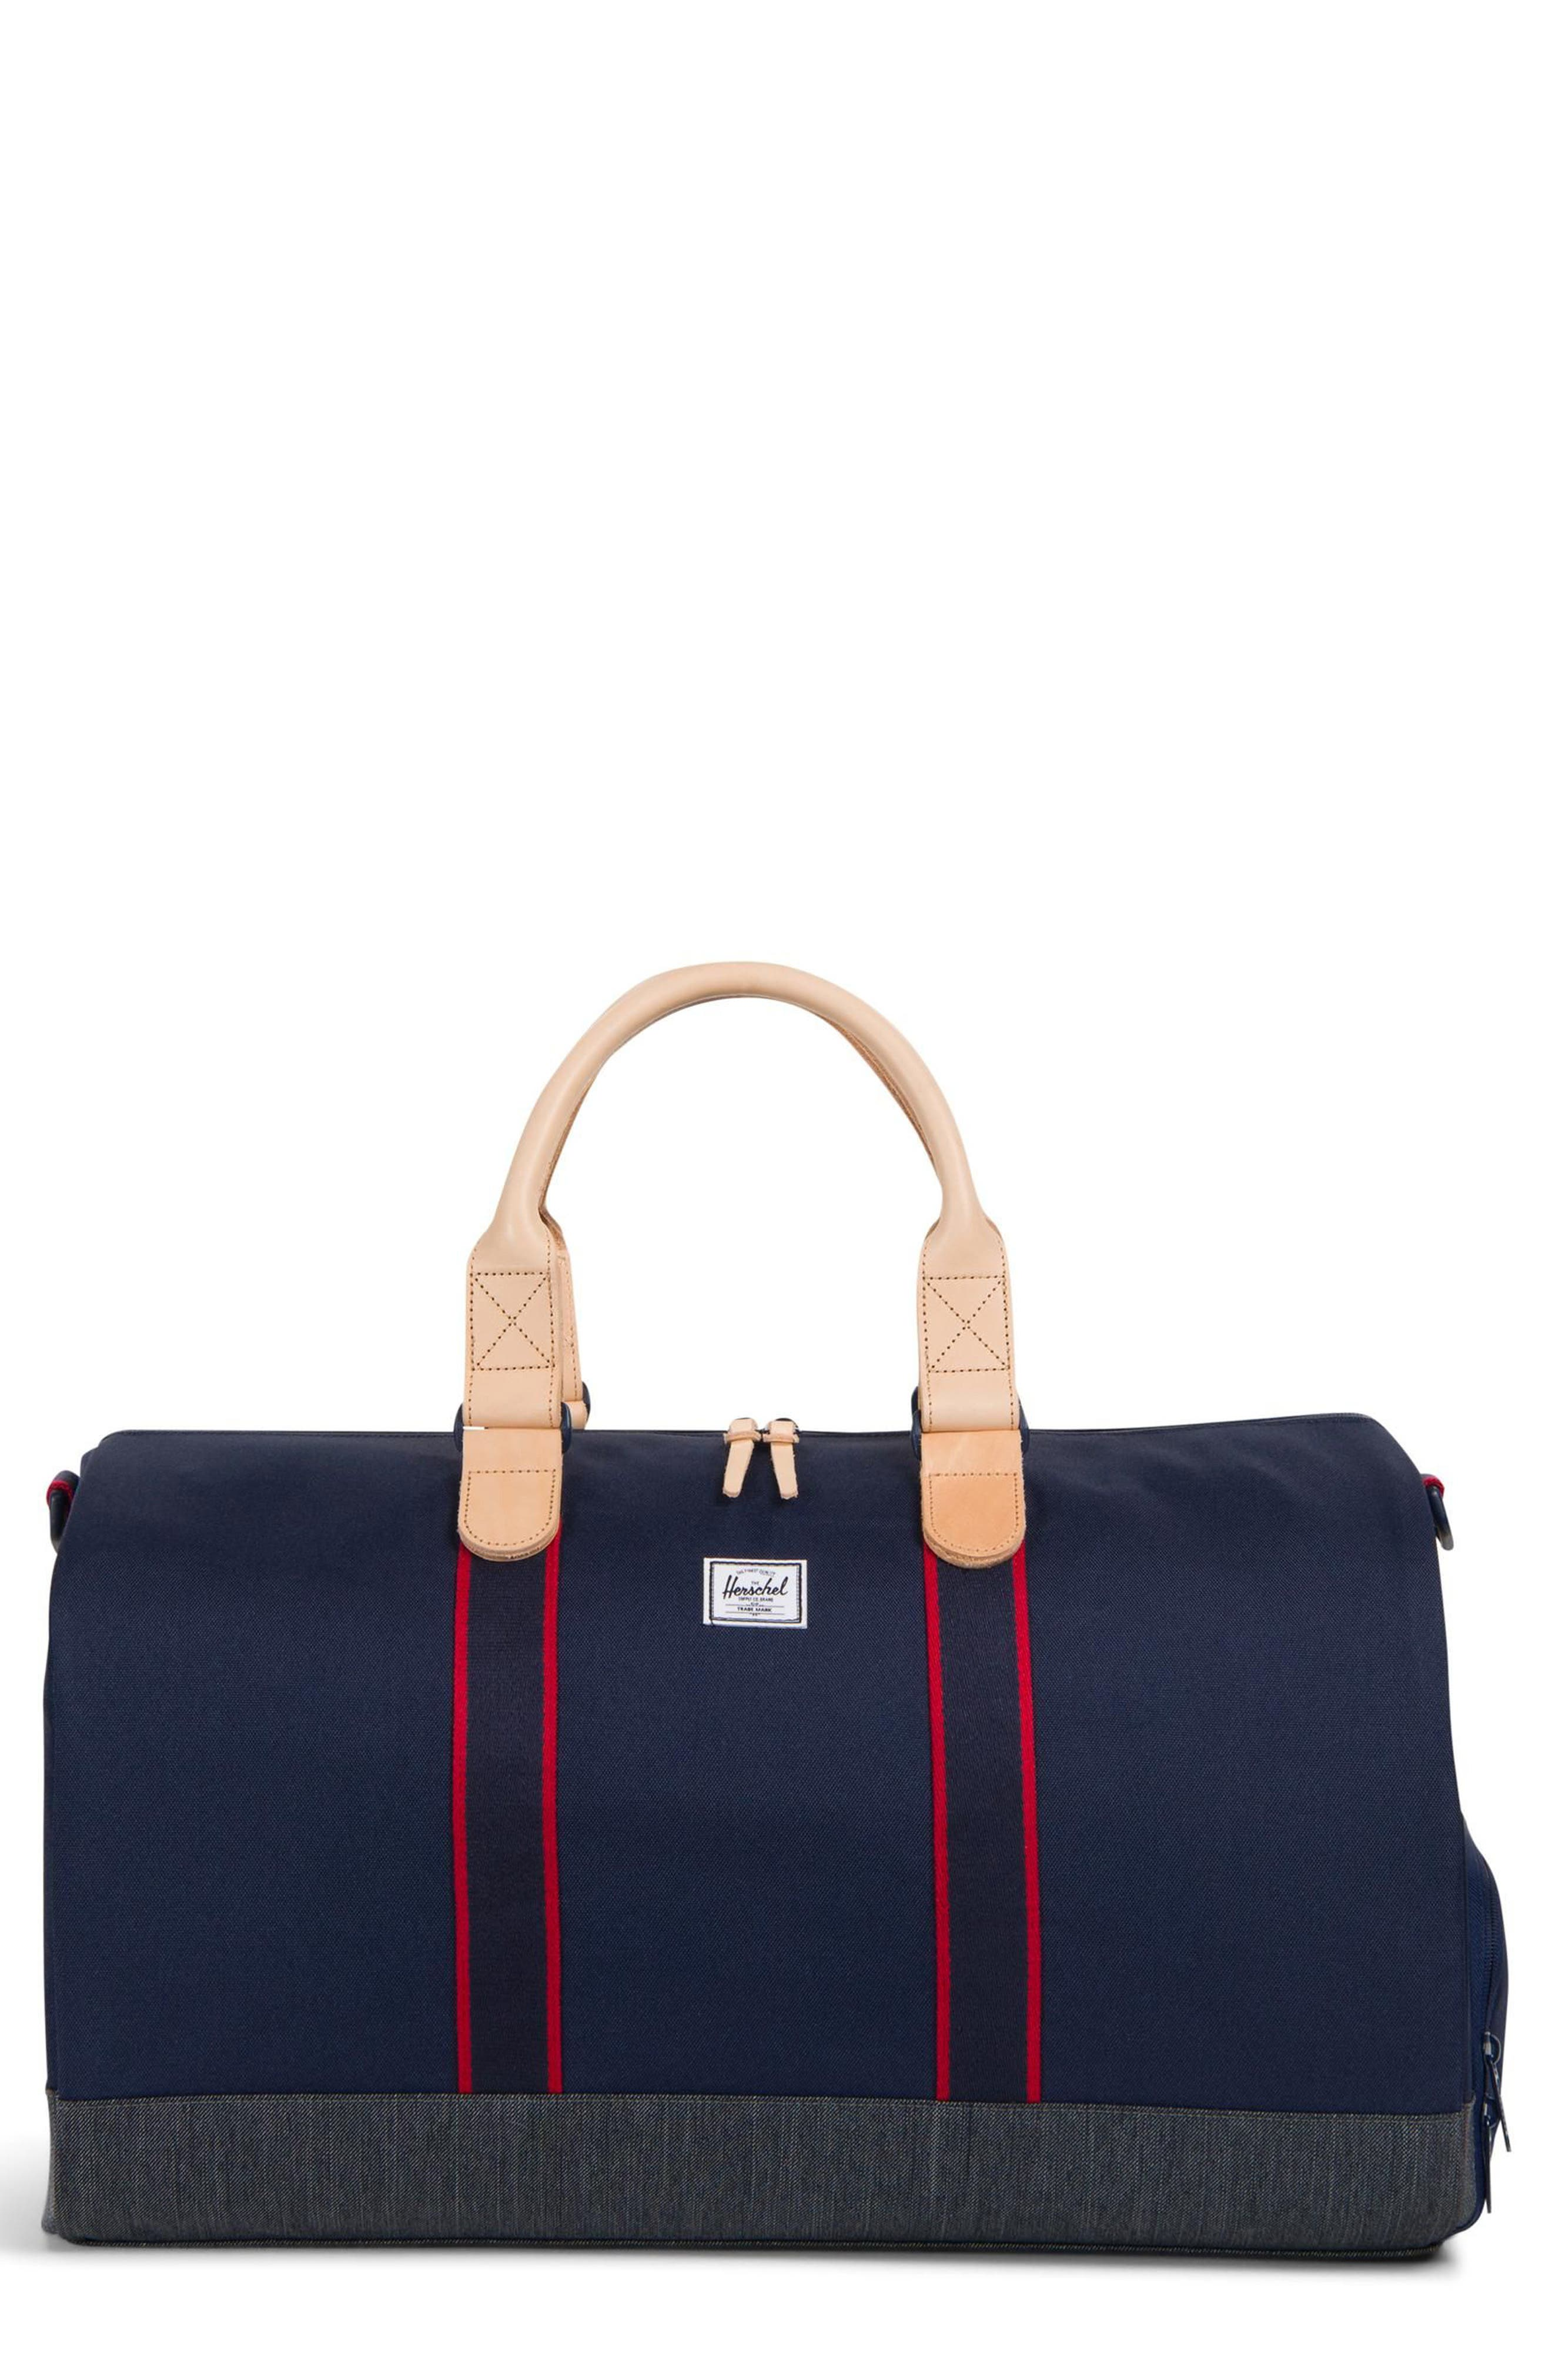 Novel Offset Duffel Bag,                         Main,                         color, 400